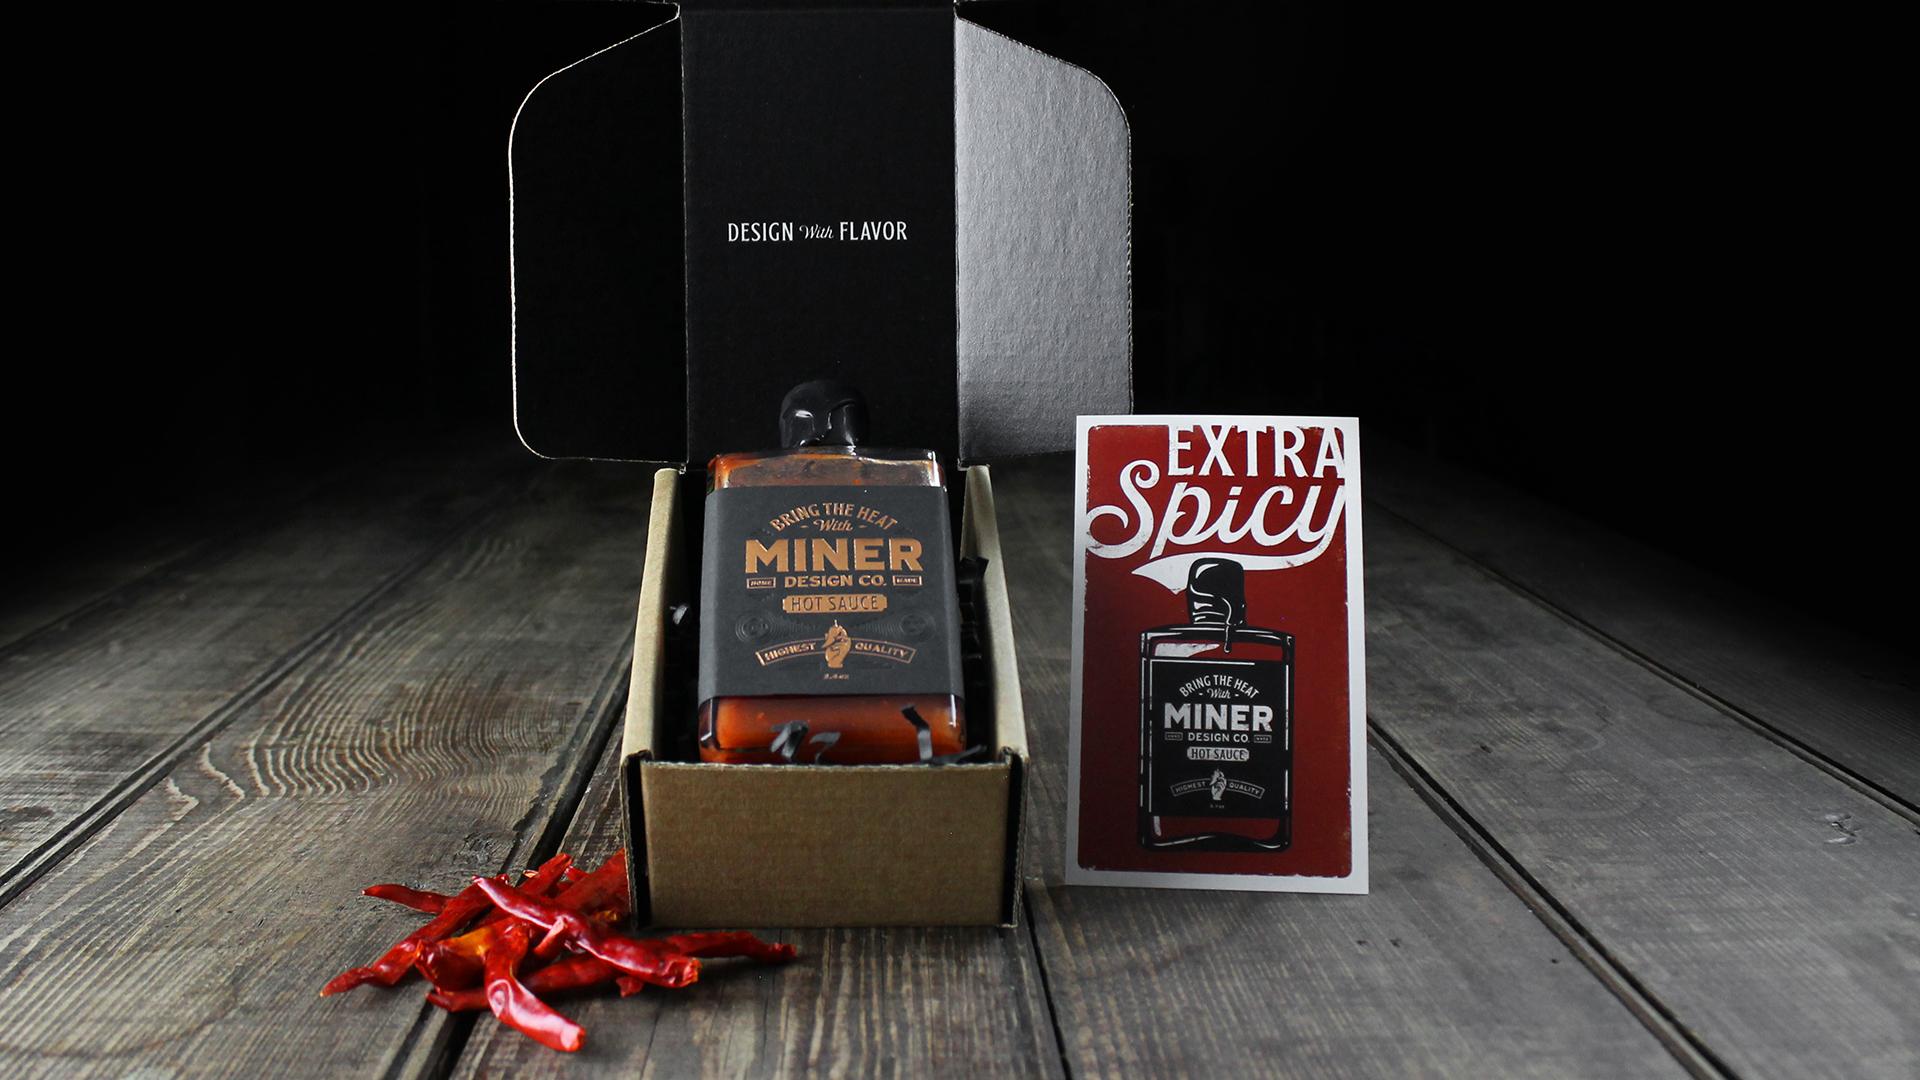 Hot Sauce Packaging Self Promotion.jpg